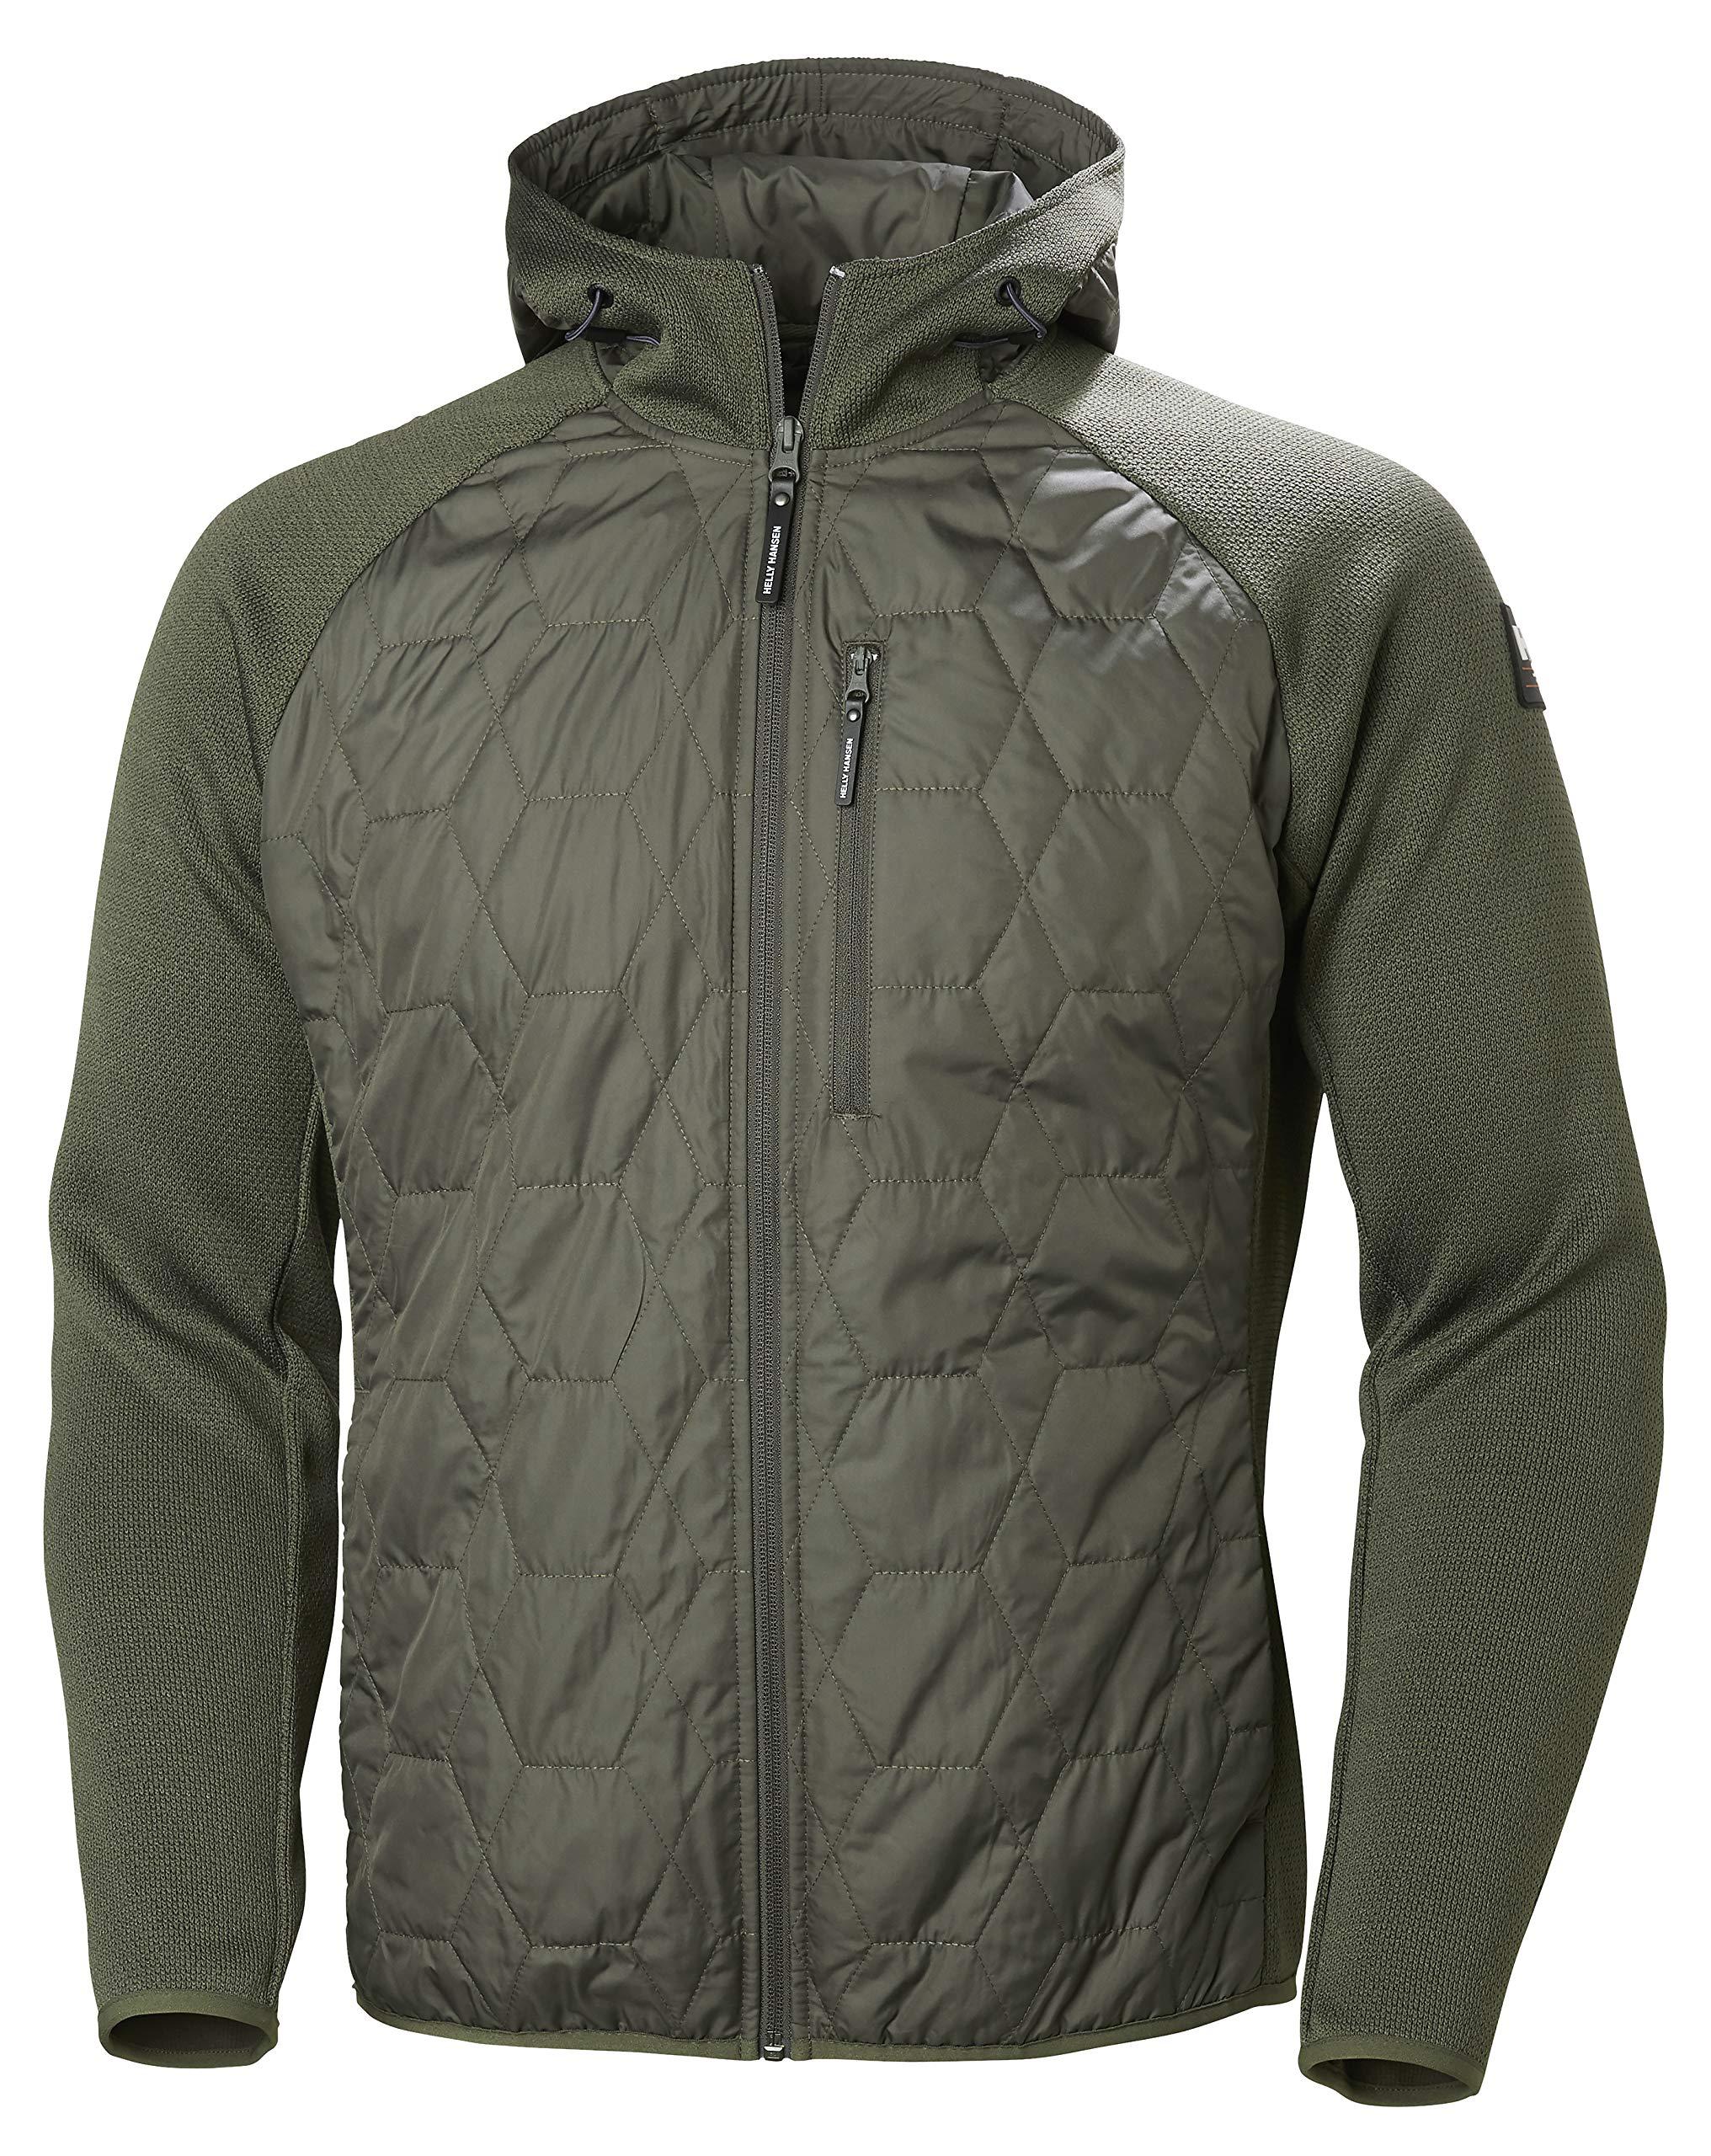 Helly Hansen Men's Shore Hybrid Hooded Light Insulator Jacket, 482 Beluga, X-Large by Helly Hansen